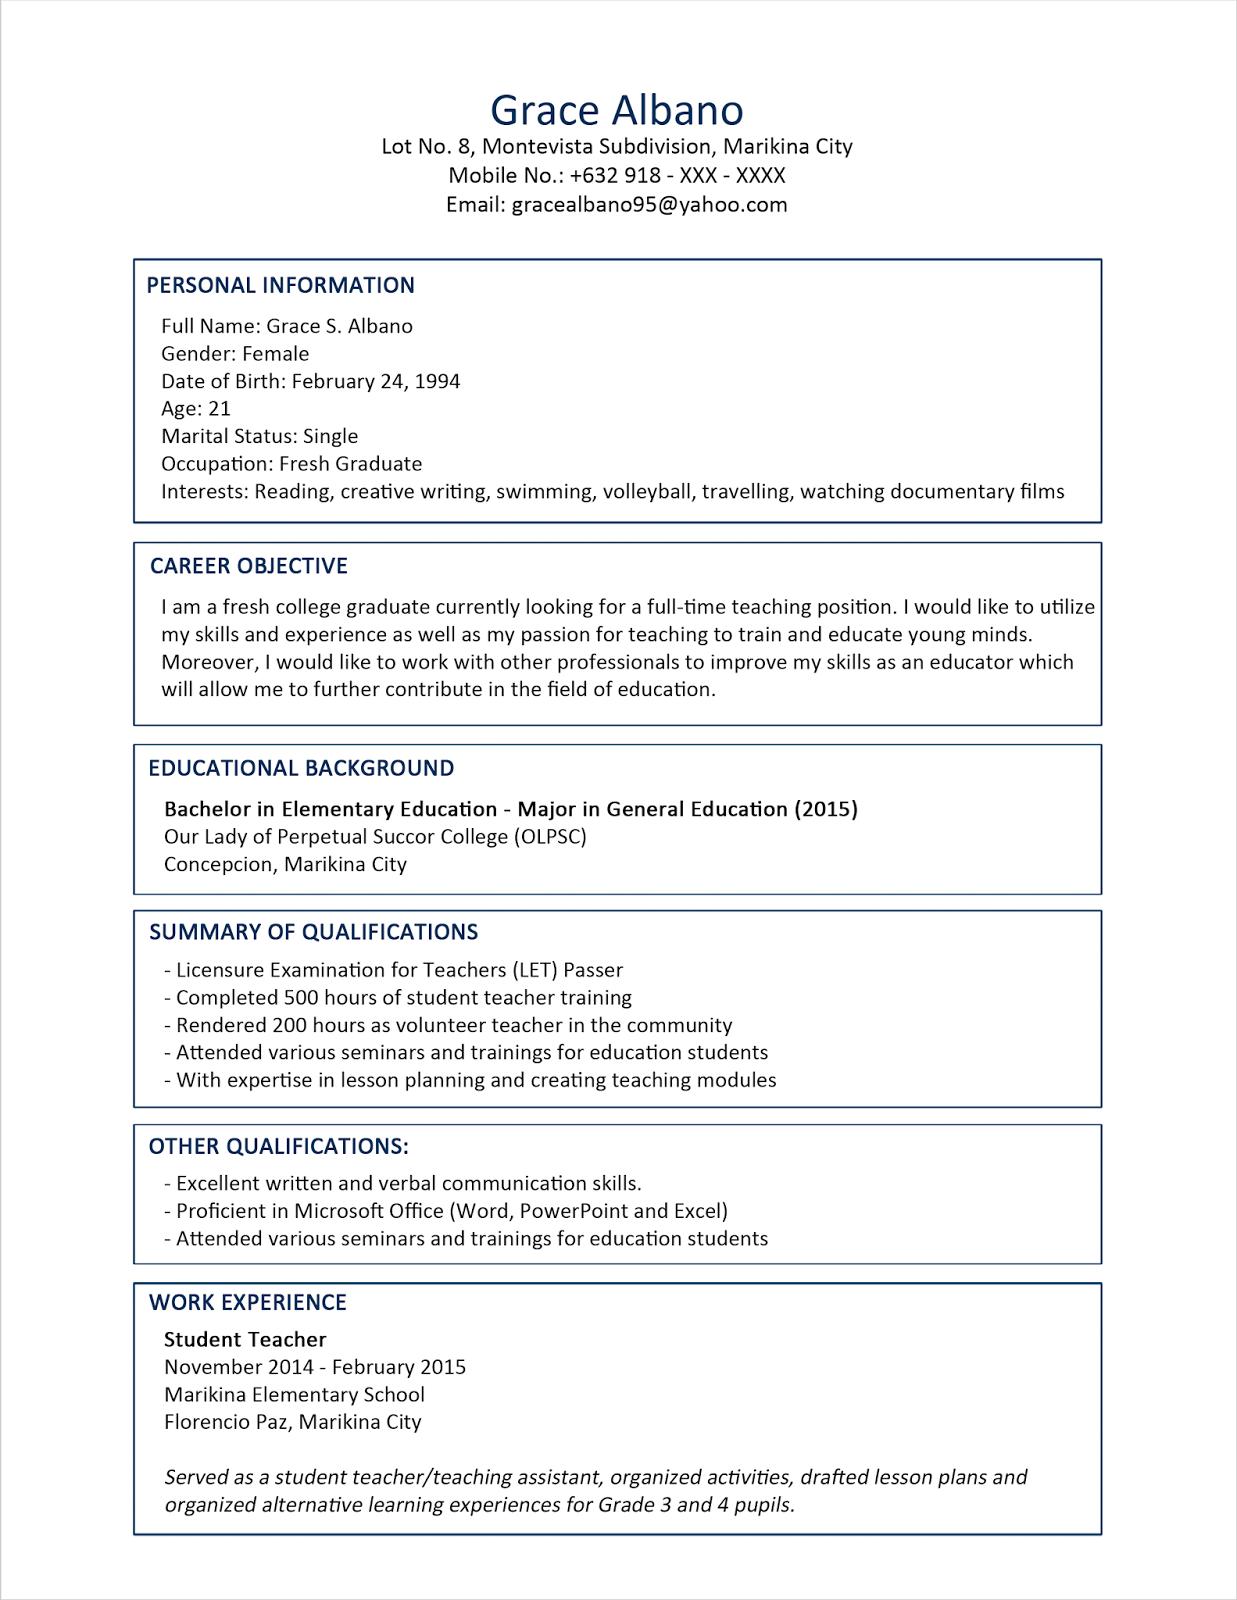 contoh resume dan tips temuduga himpunan contoh resume 2015